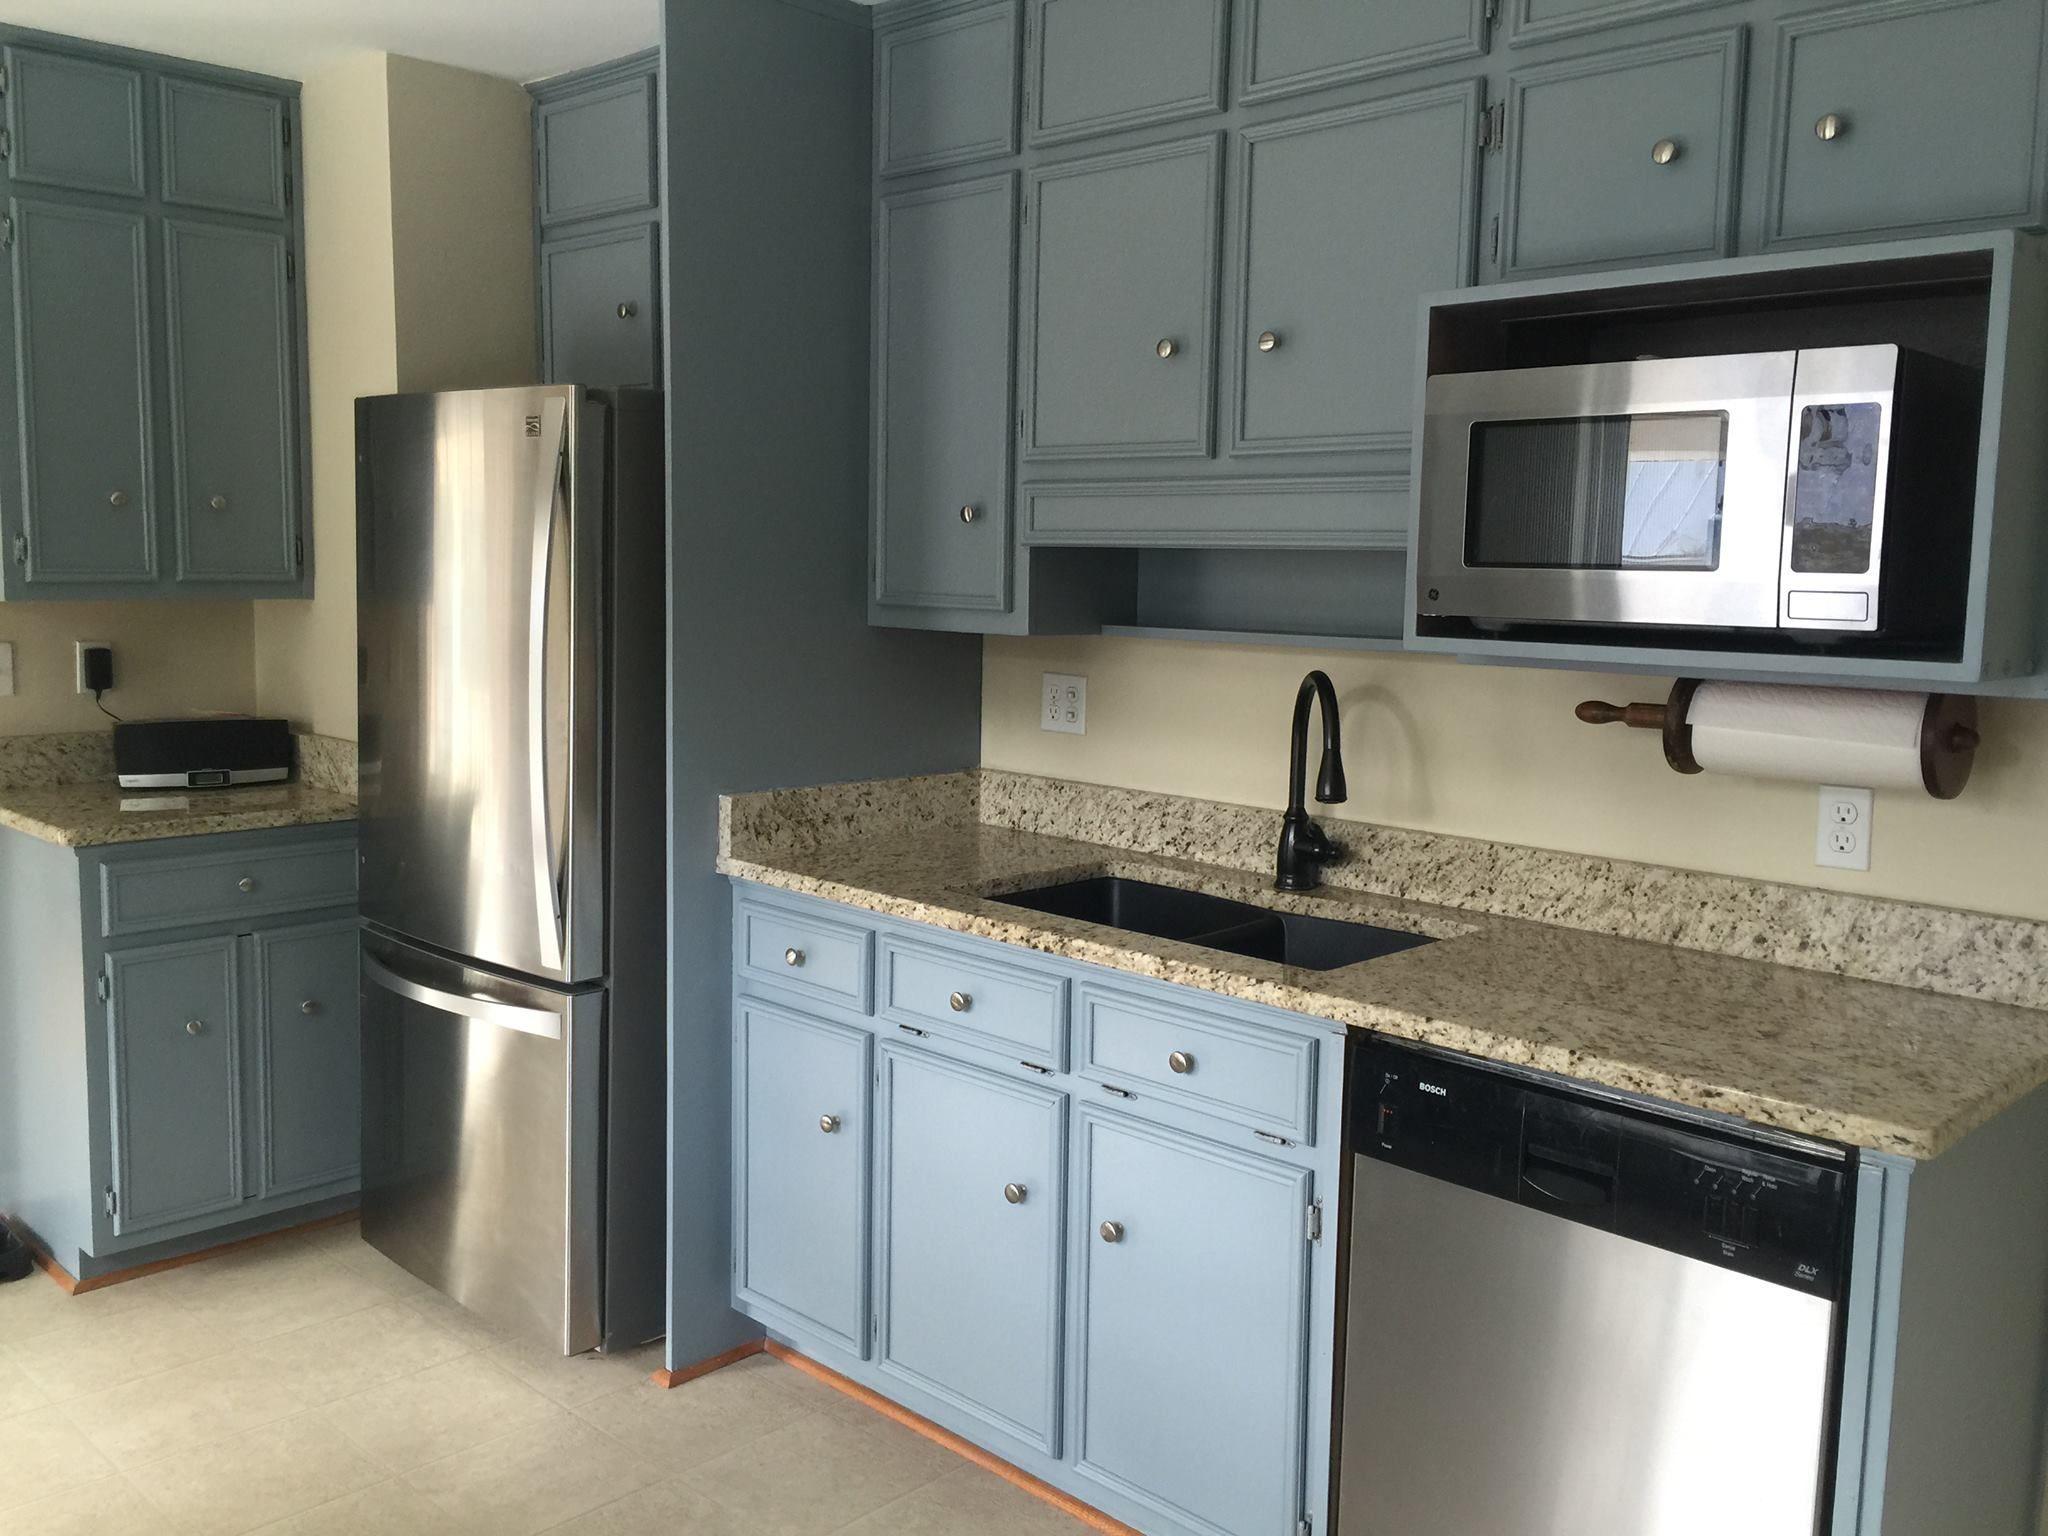 van courtland blue painted cabinets bedroom vanity set blue painted kitchen cabinets blue on kitchen cabinets blue id=45981